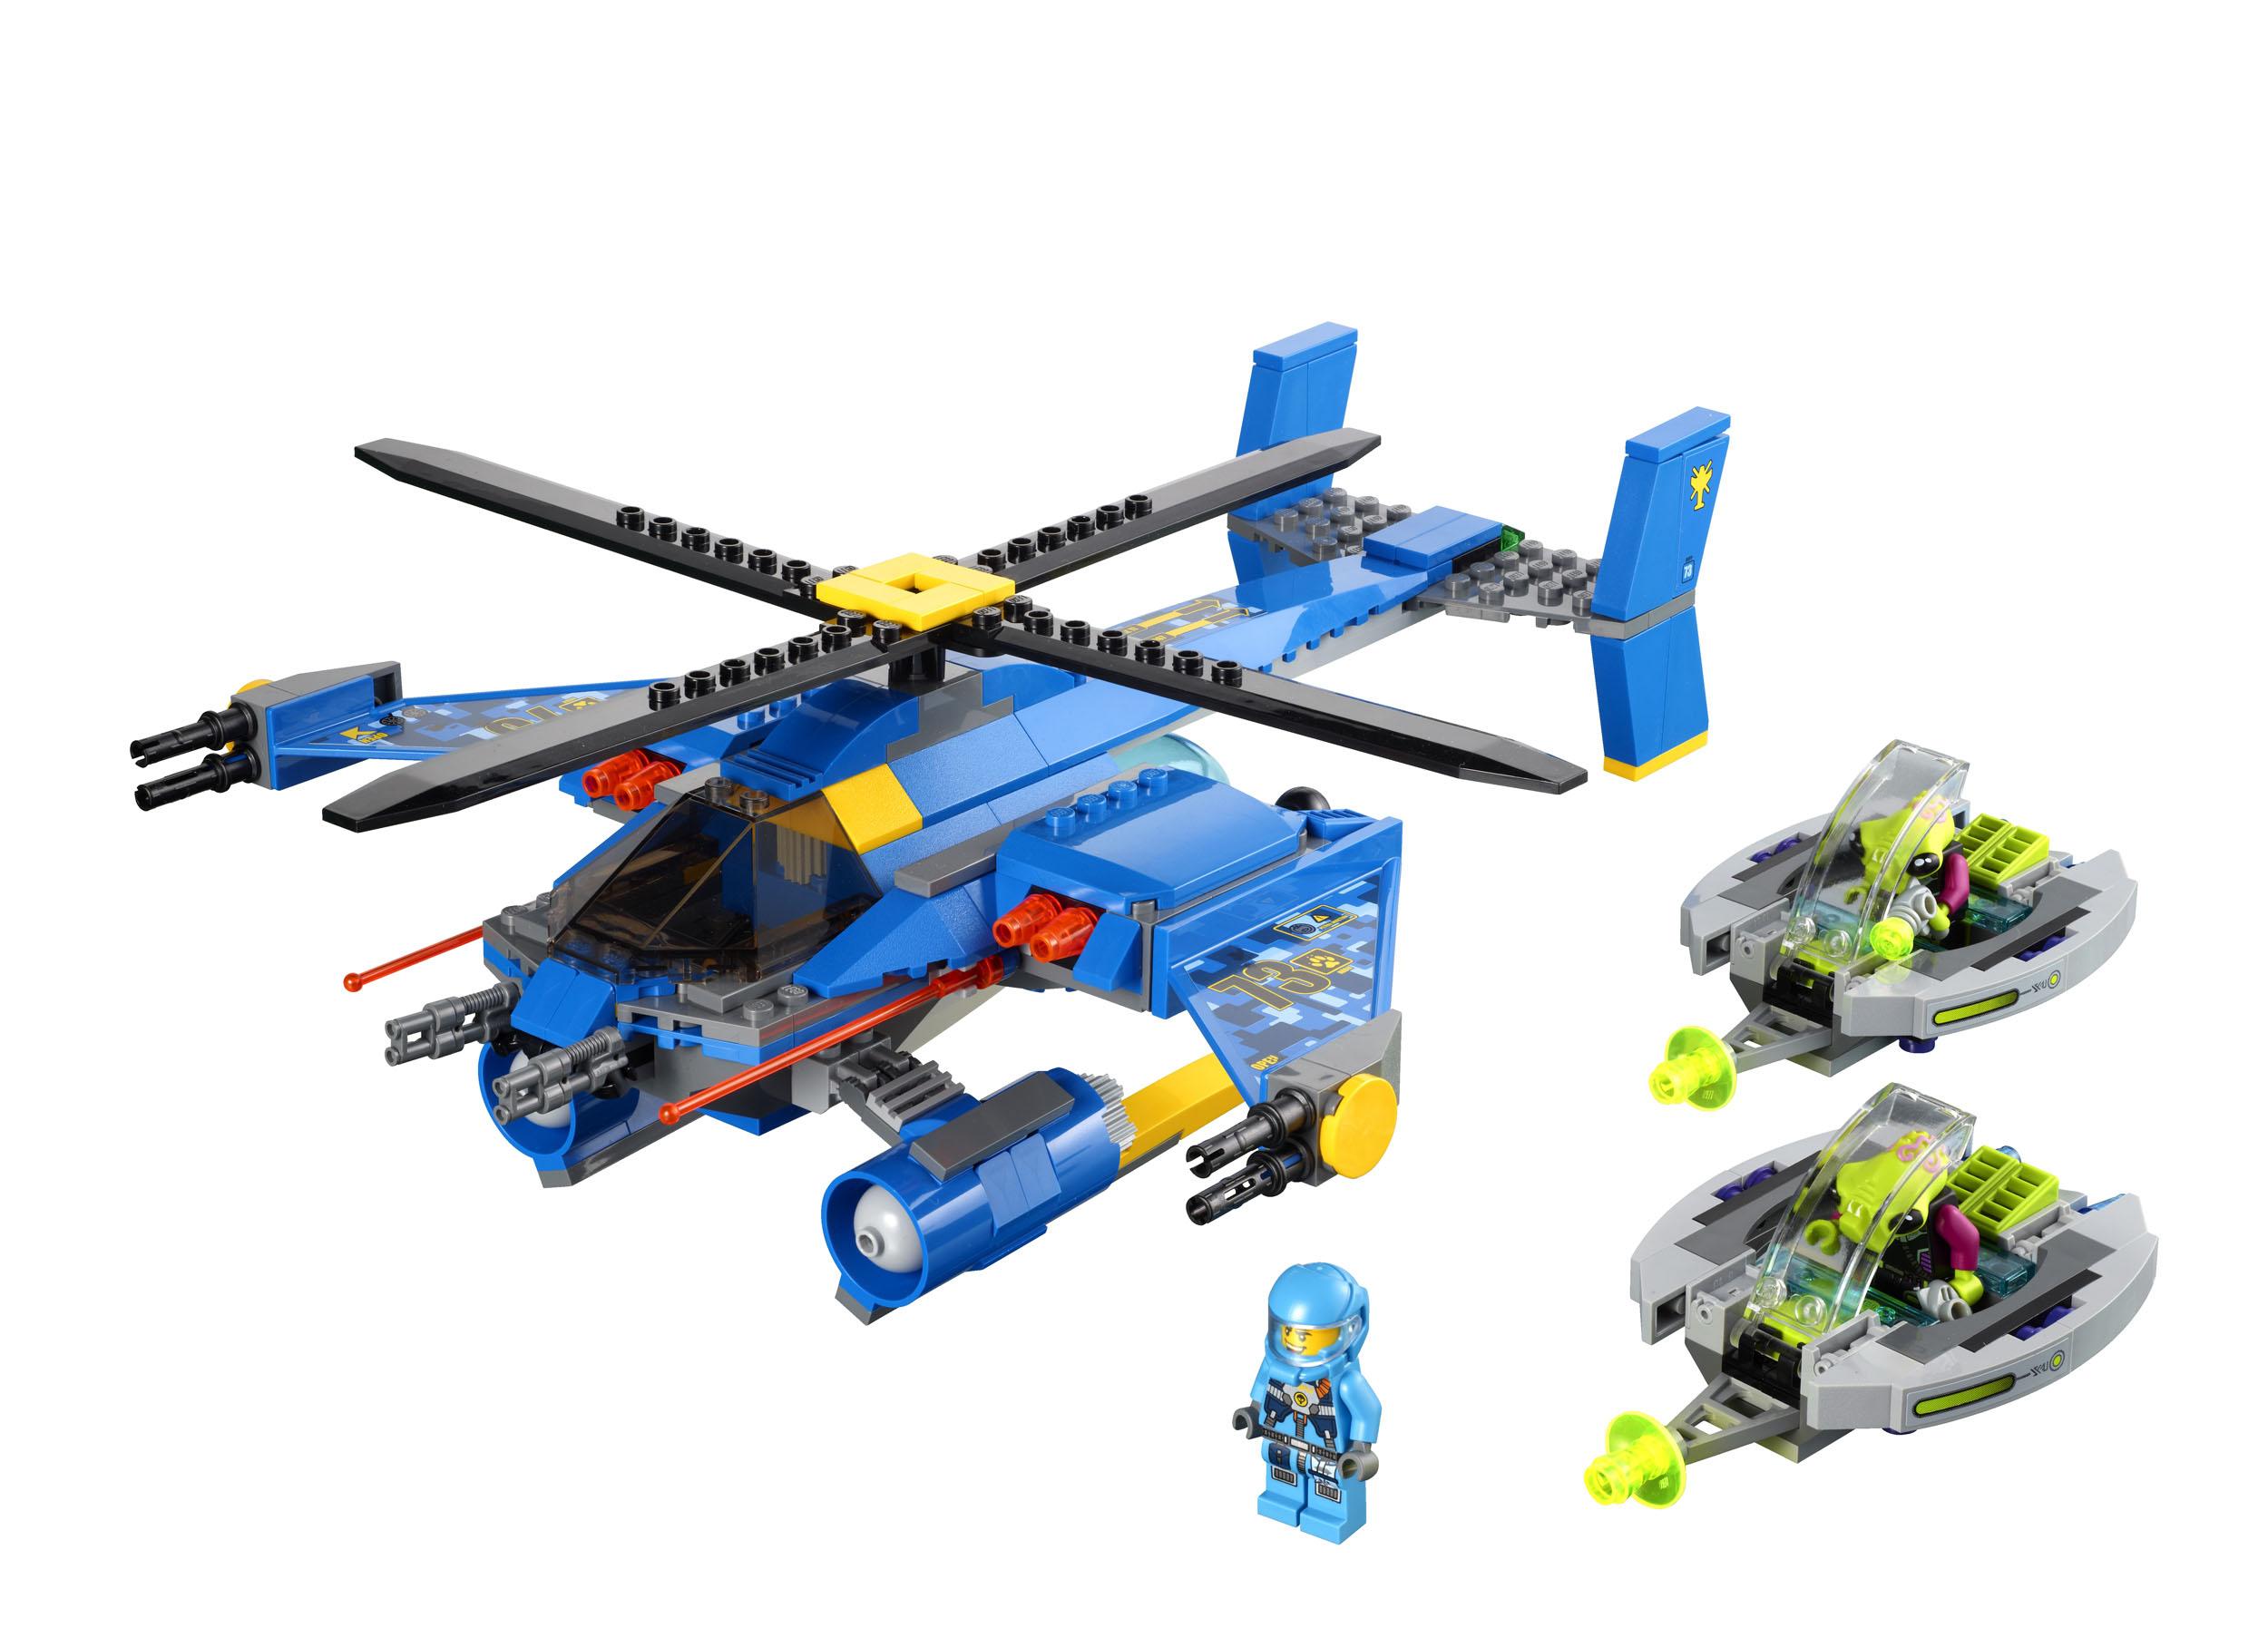 2011 Alien Conquest 7067_lego_jet_copter_encounter